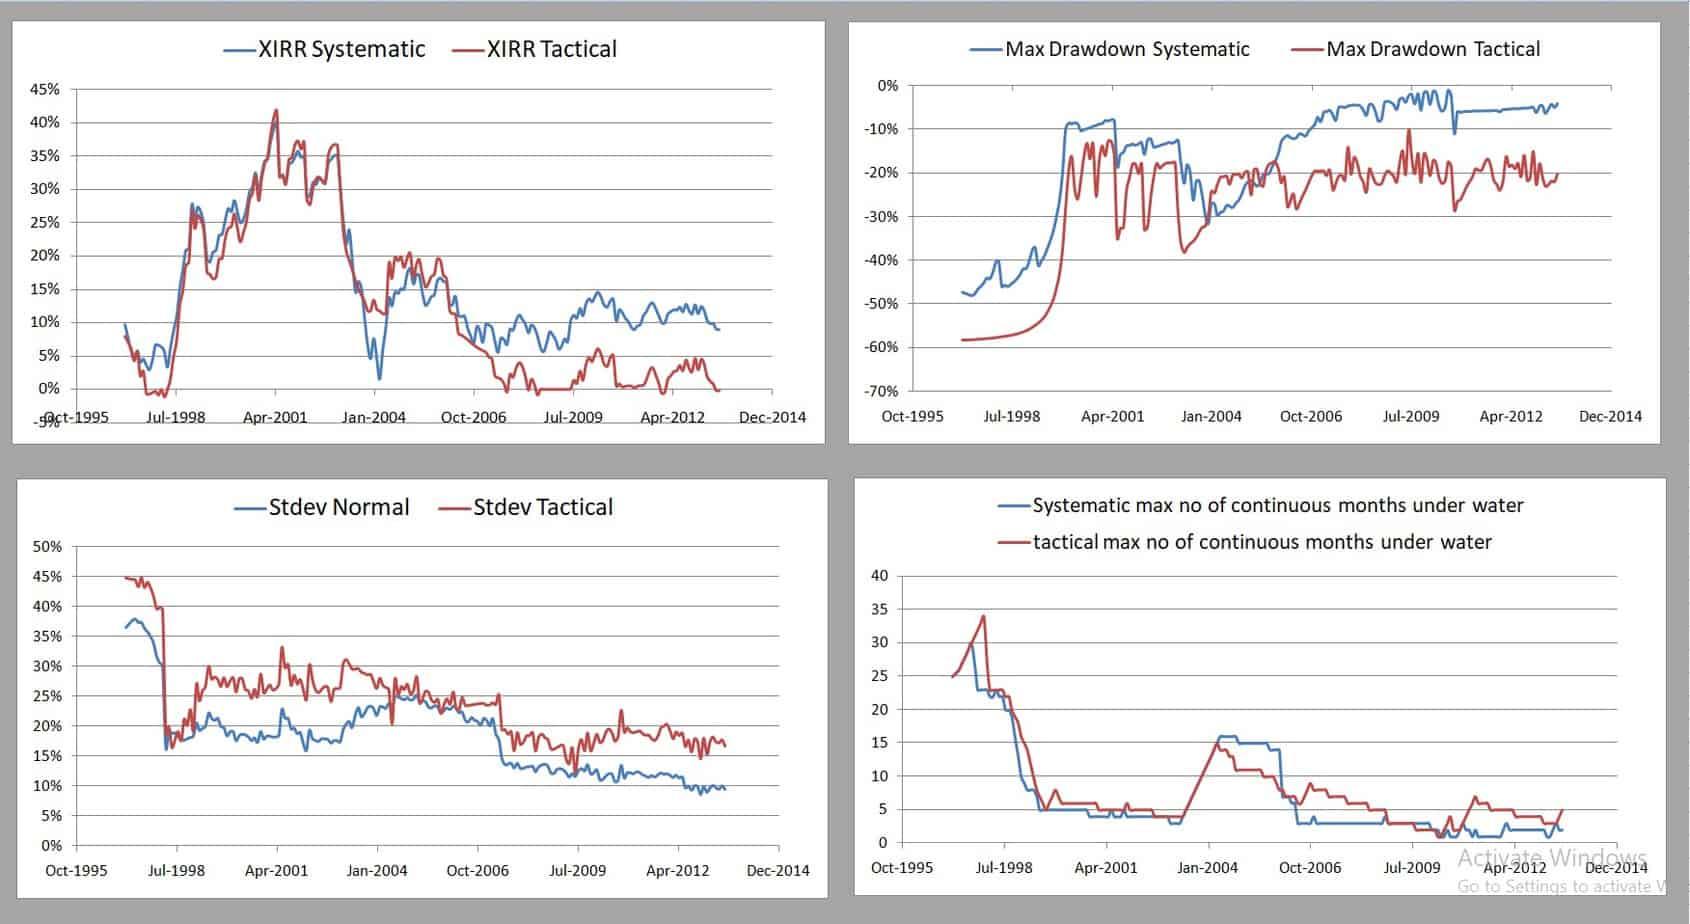 TAA Mfs 10MMA 70 30 5Y - Tactical Asset Allocation Backtest Part 3: Short-Term Vs Long-Term